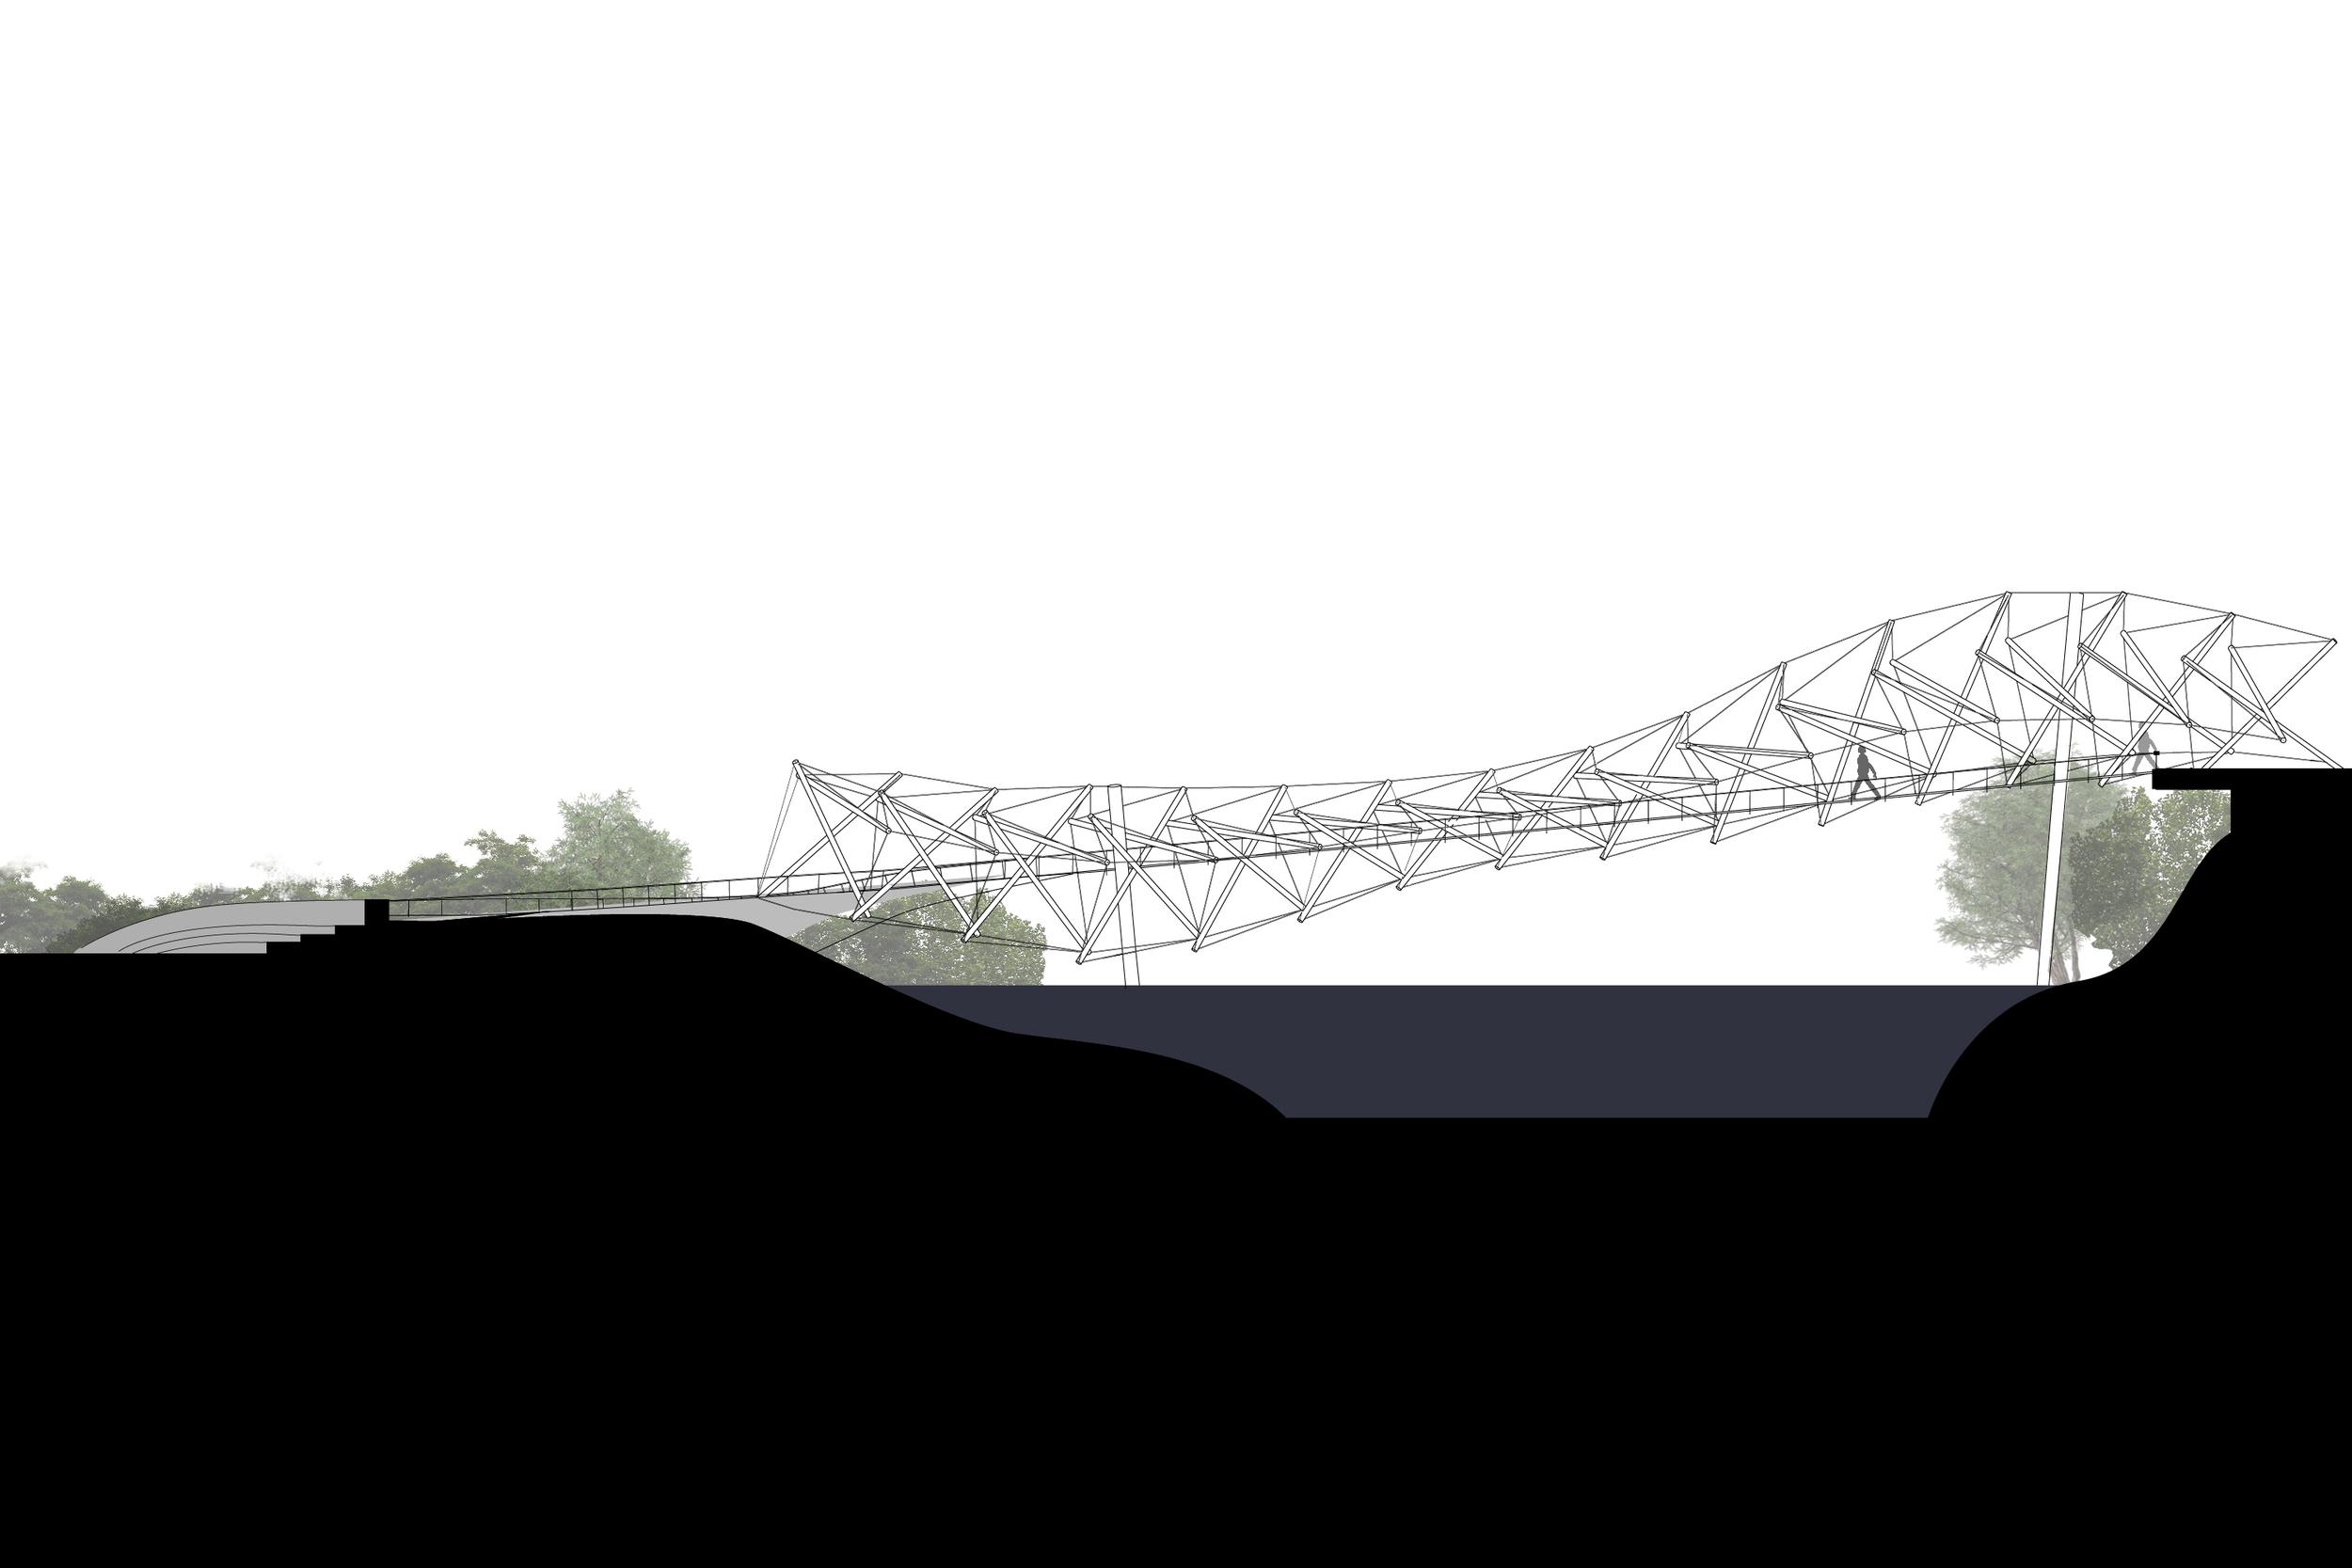 062_Tensegrity Bridge-elevation_resize.jpg